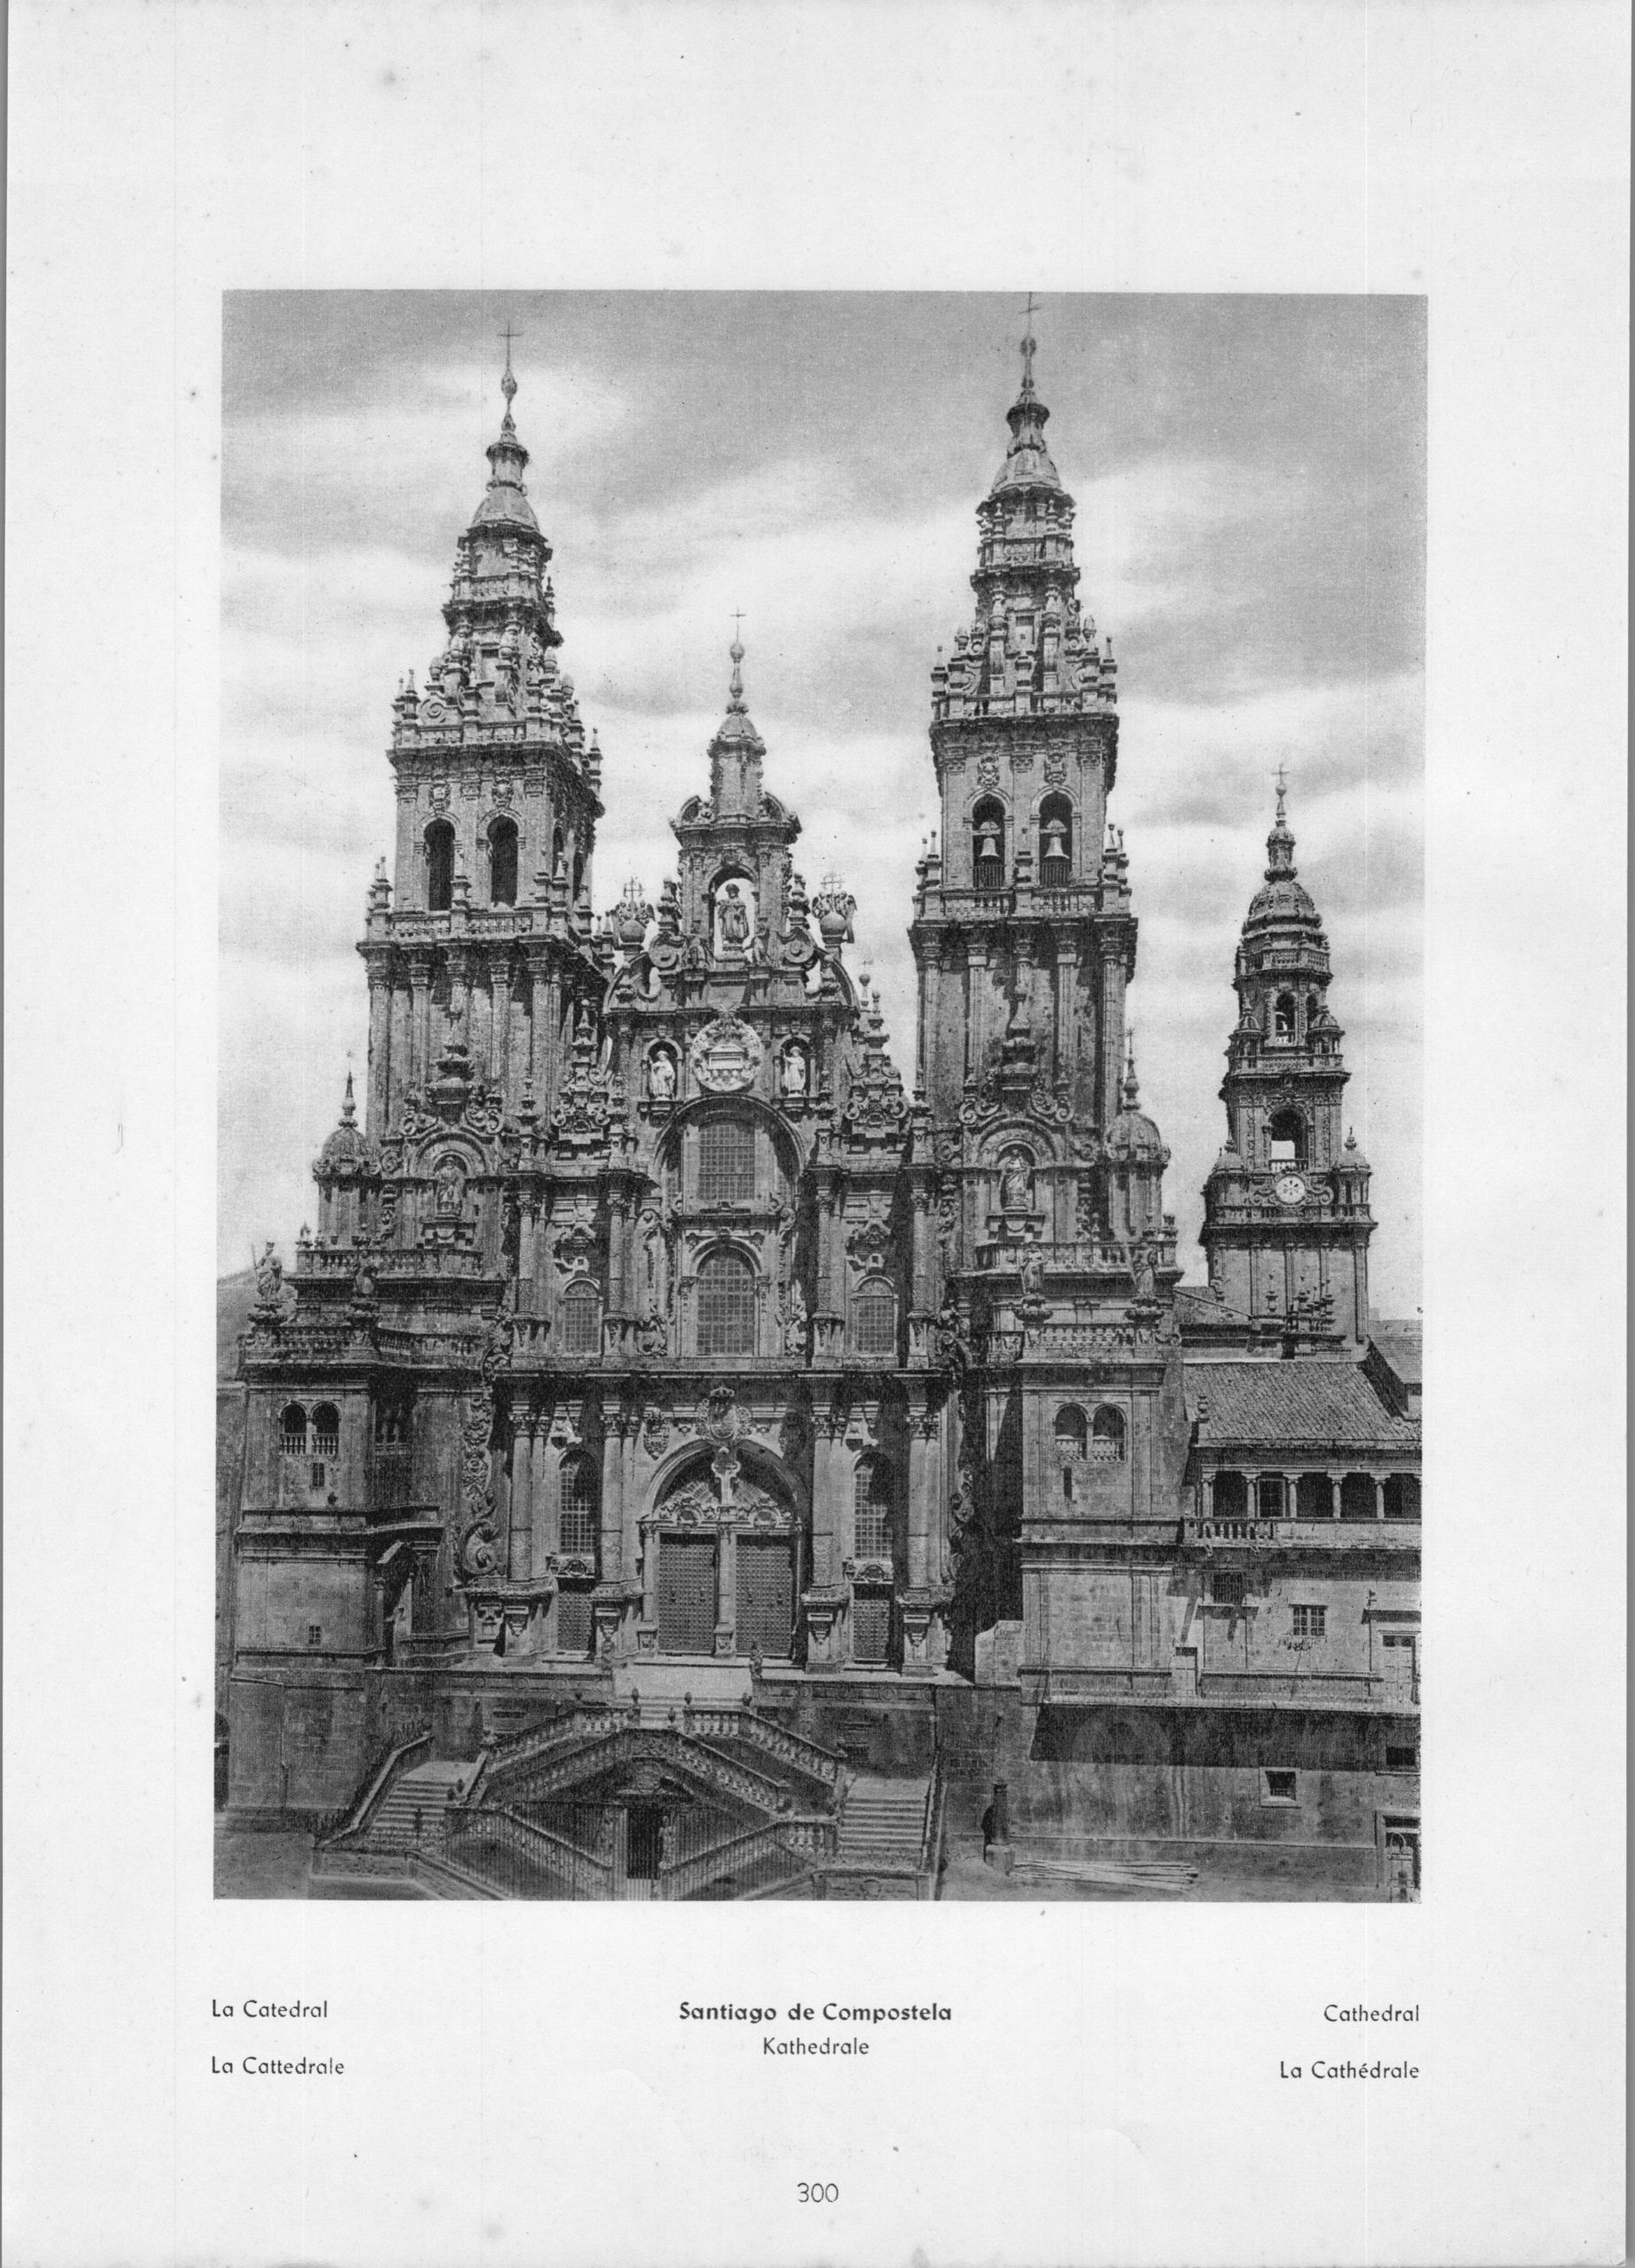 Santiago de Compostela - La Catedral